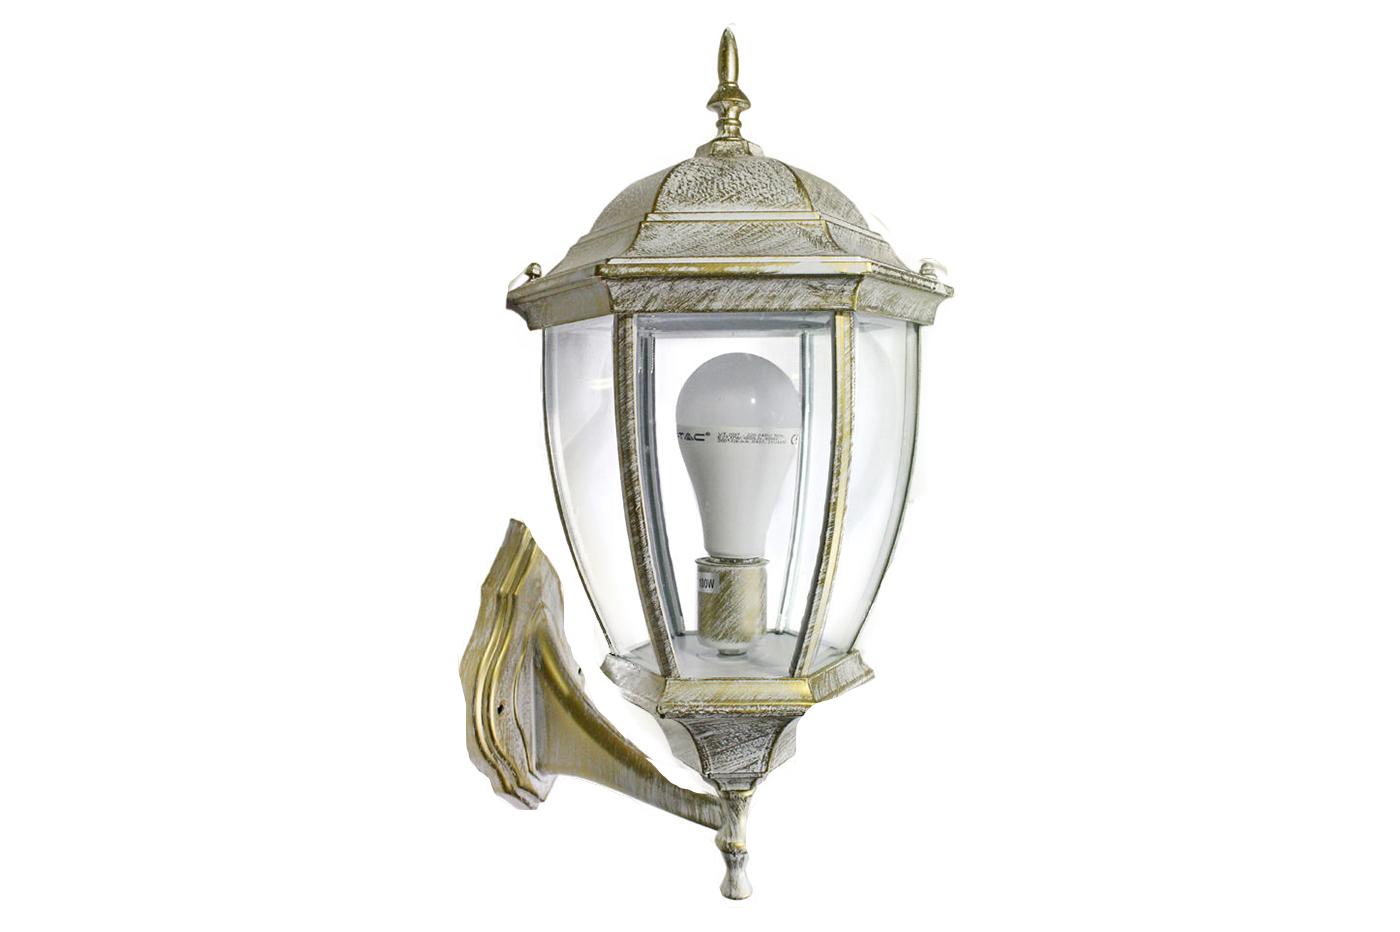 Bes 24907 applique beselettronica applique lampada lanterna